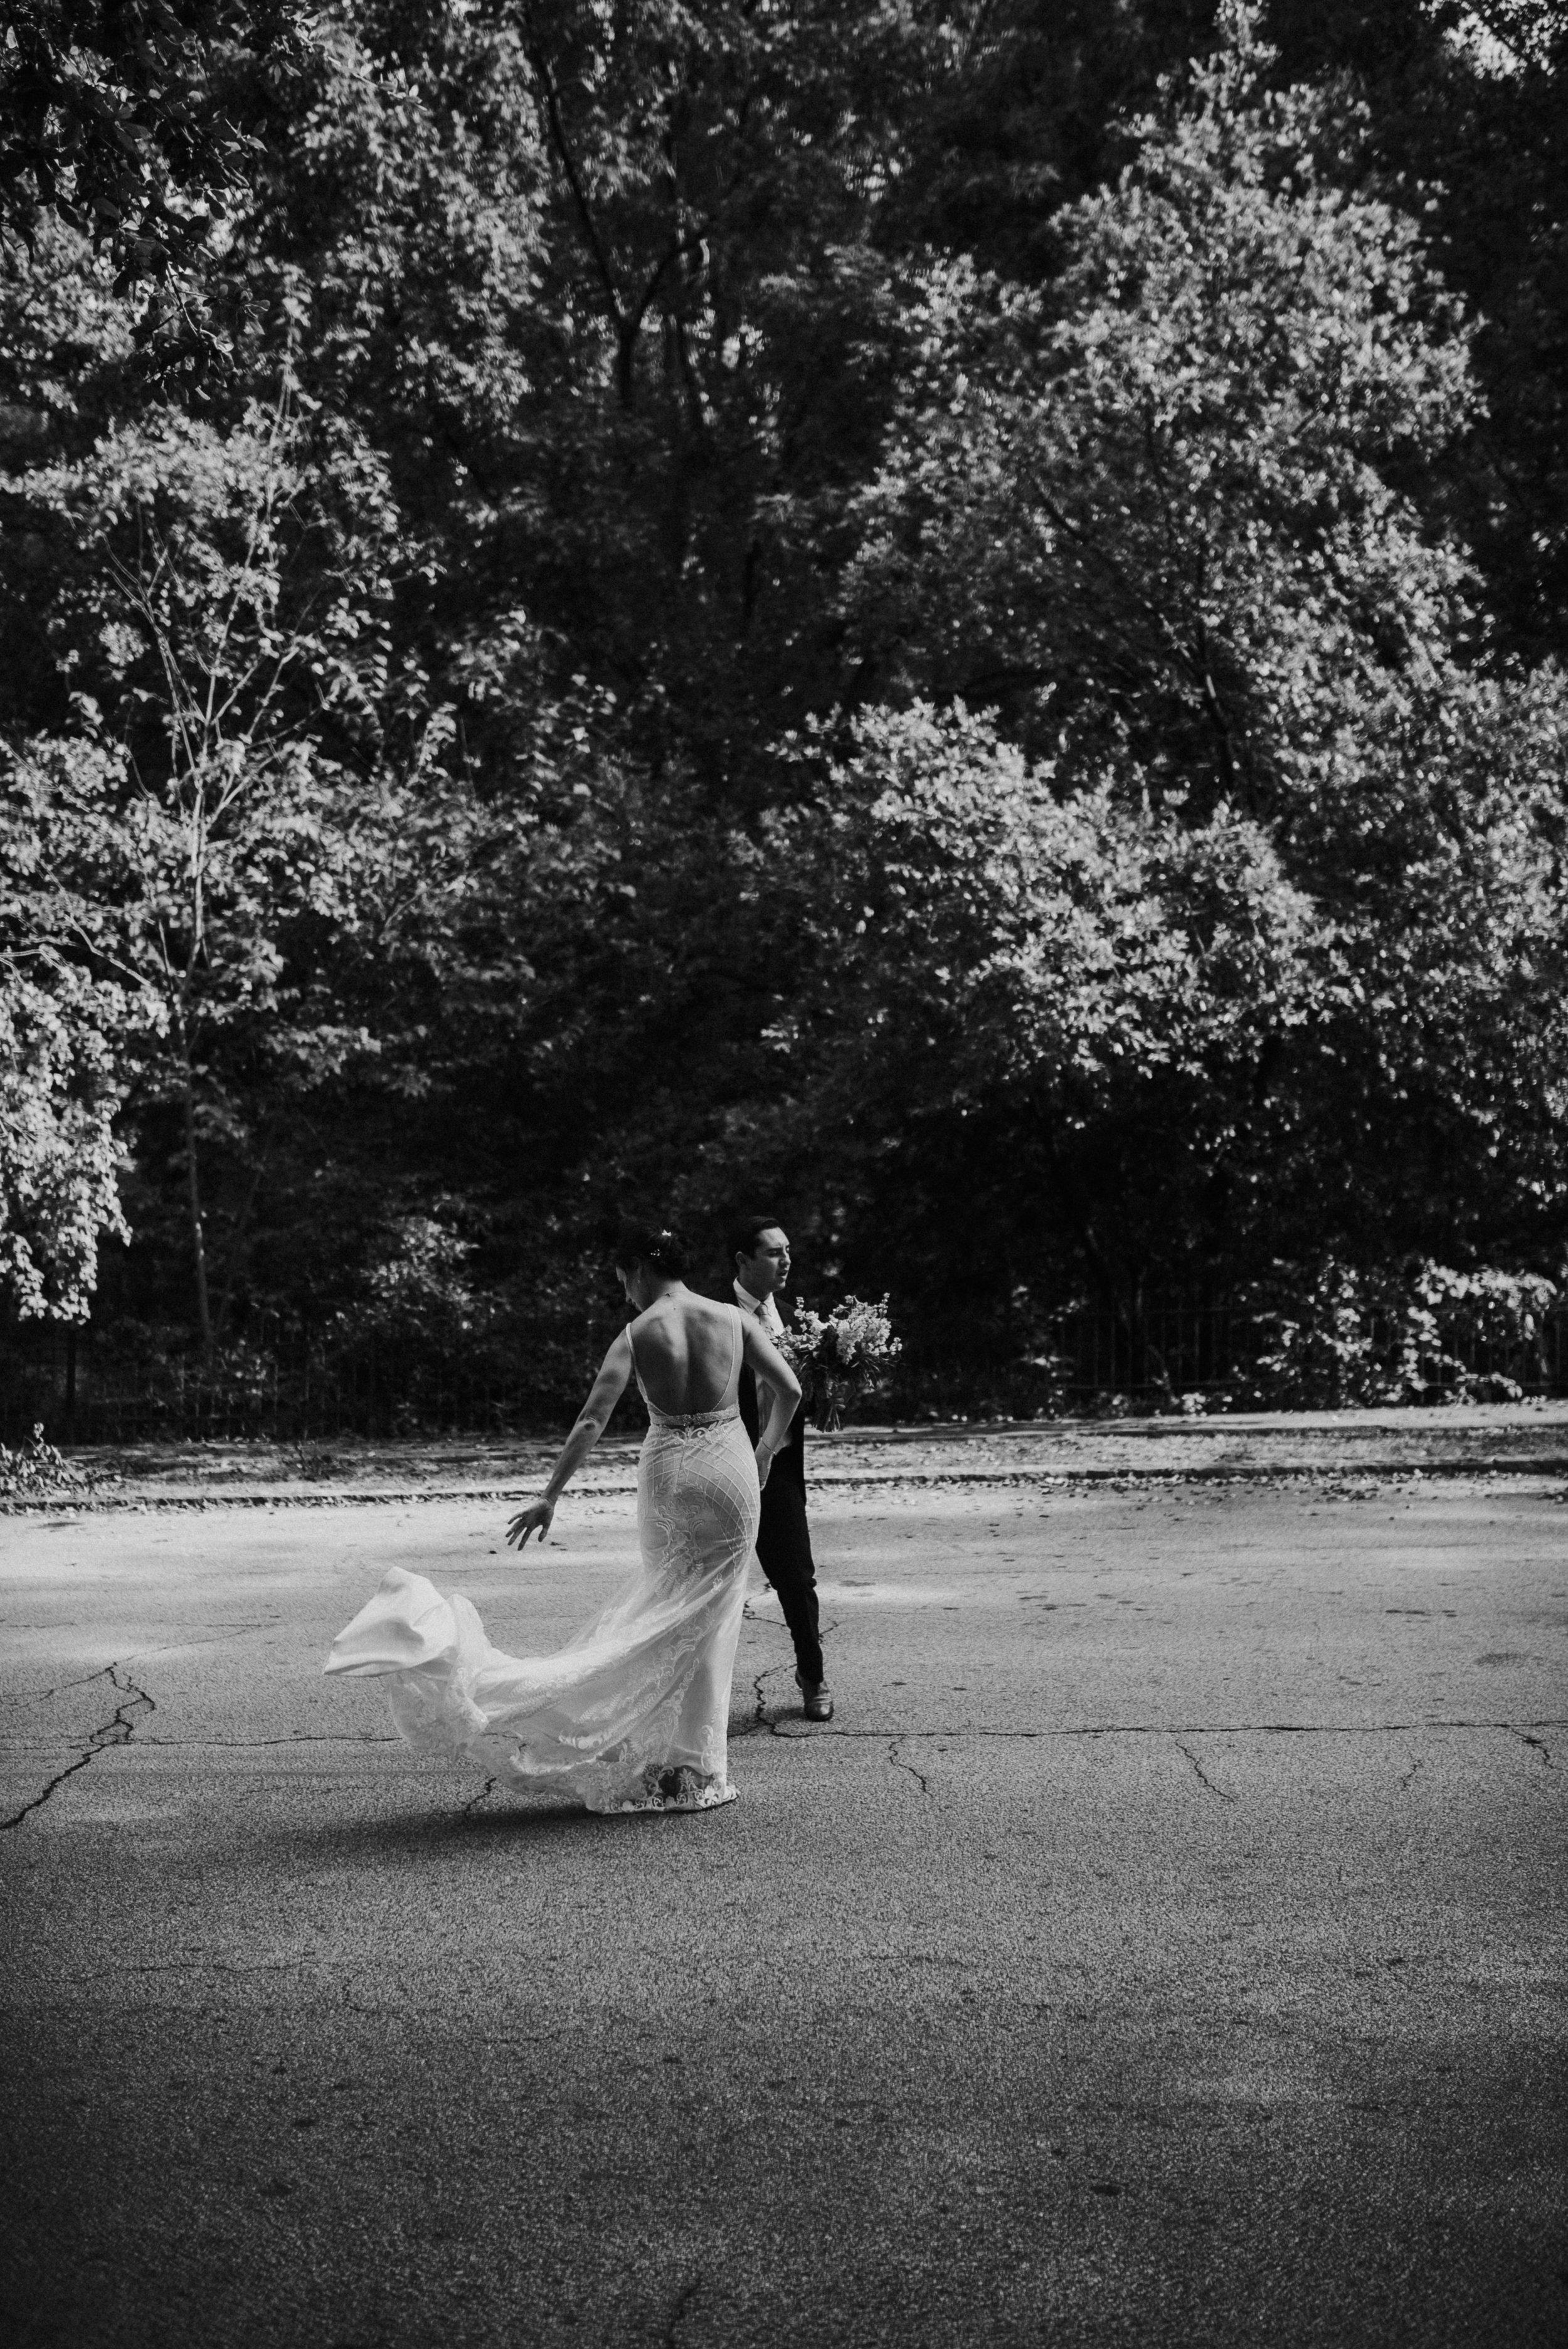 Bride's windblown dress at The Trolley Barn in Atlanta, GA